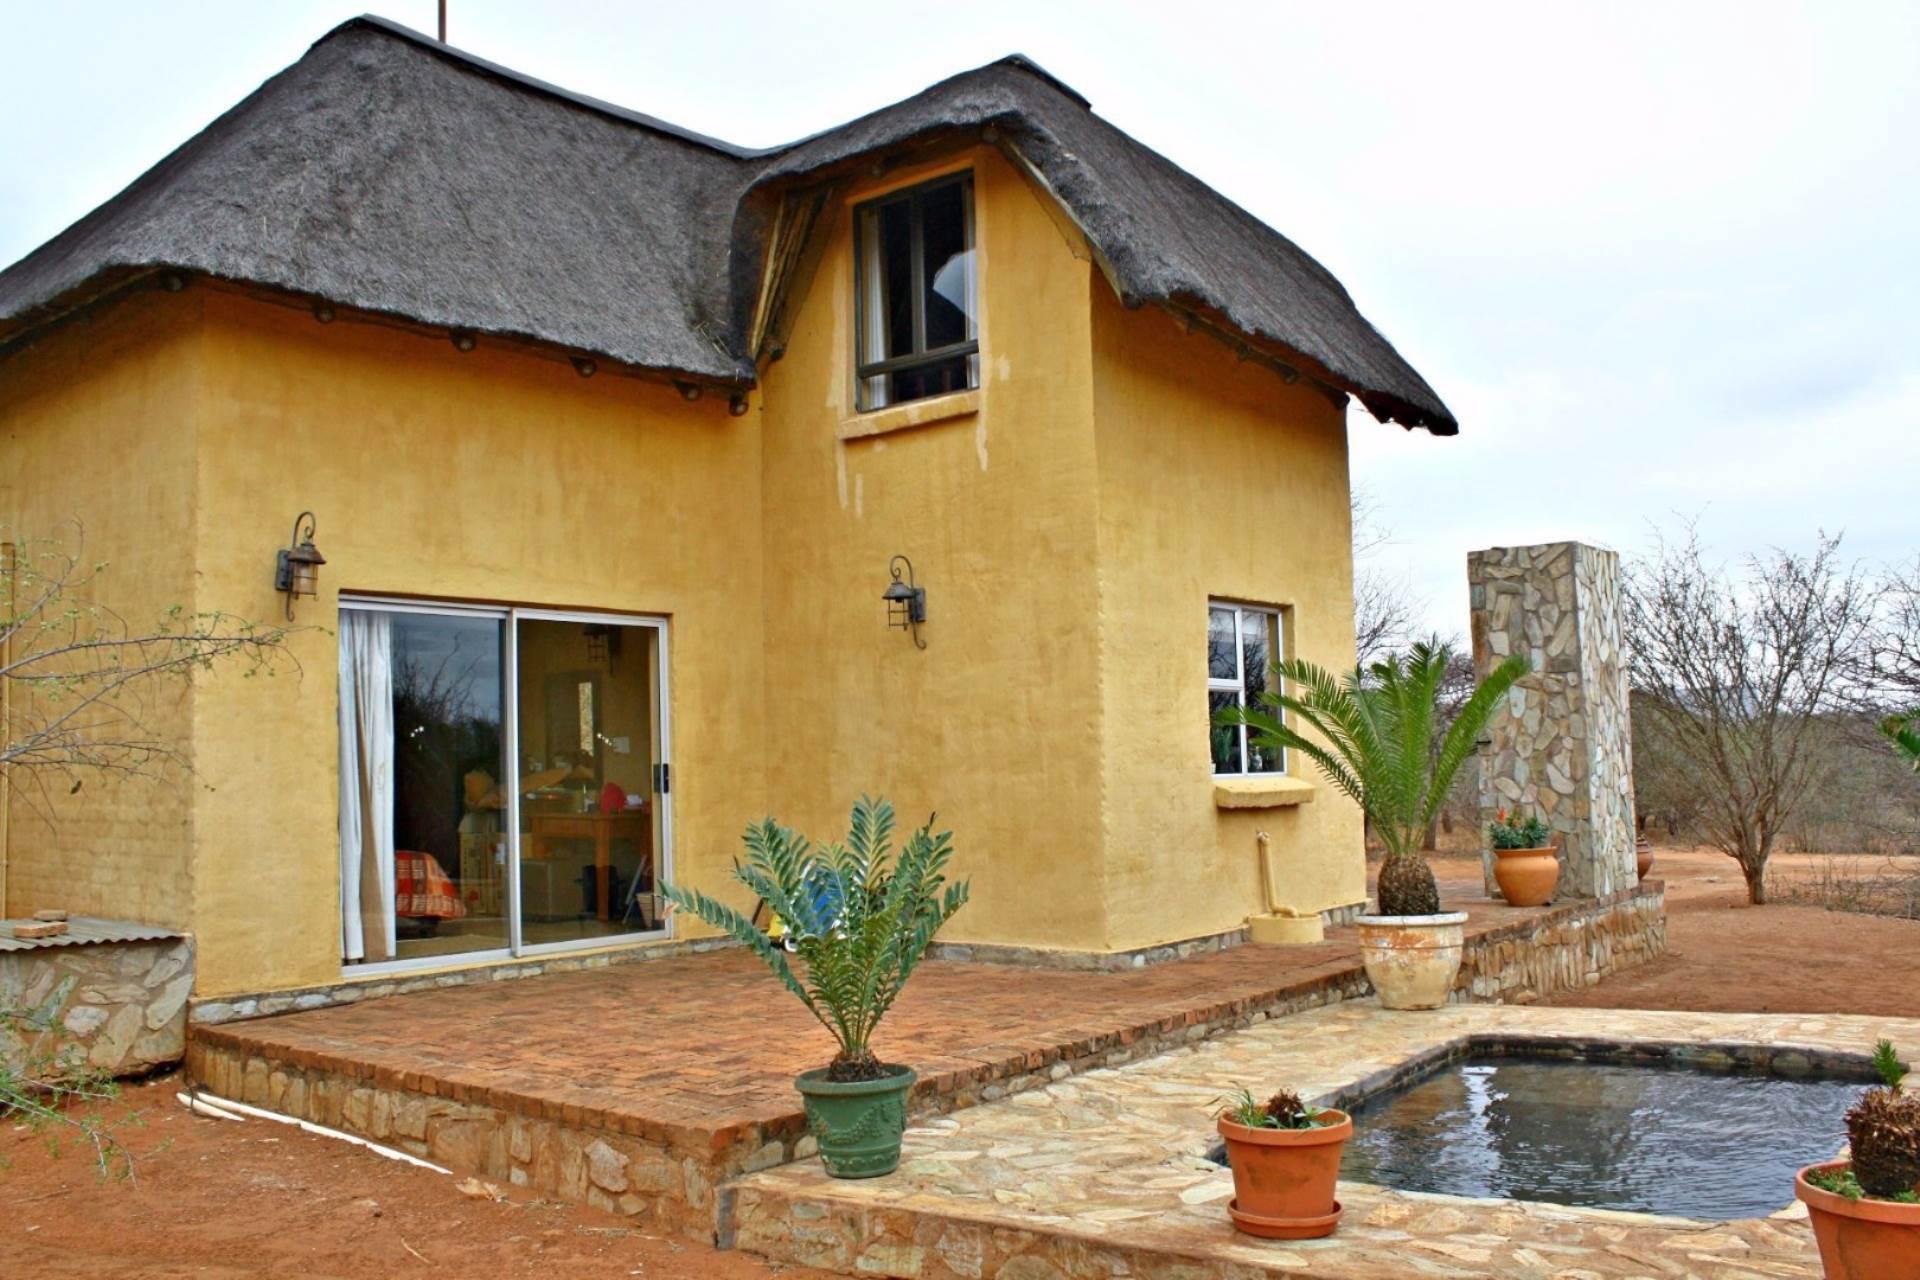 2 BedroomHouse For Sale In Hoedspruit Wildlife Estate